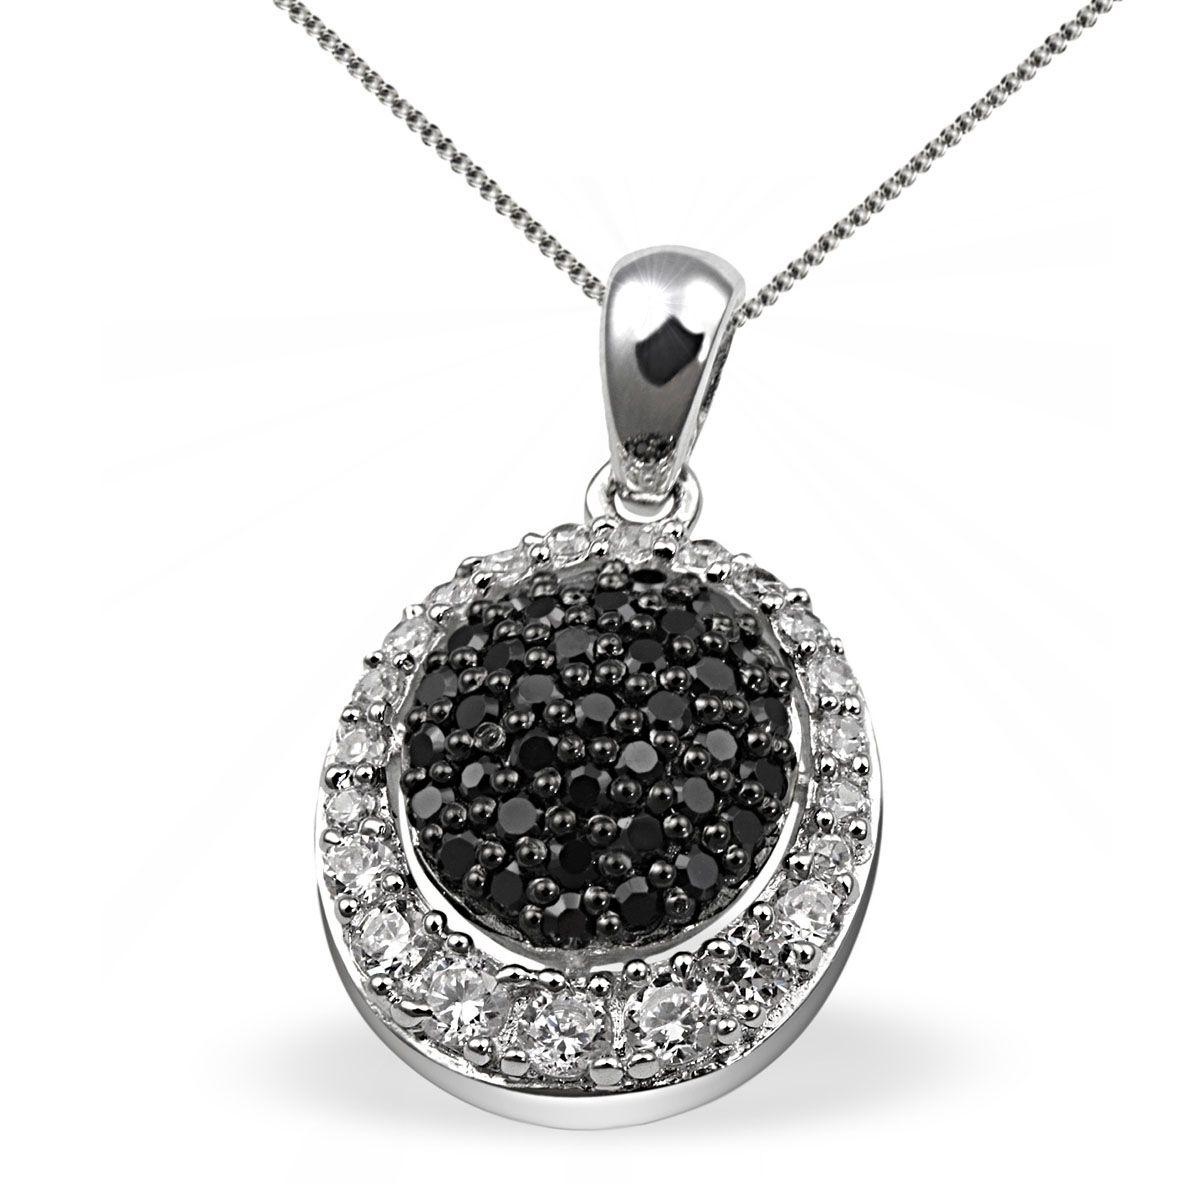 AVERDIN Averdin Collier Silber 925 schwarz weisse Zirkonia Pavee